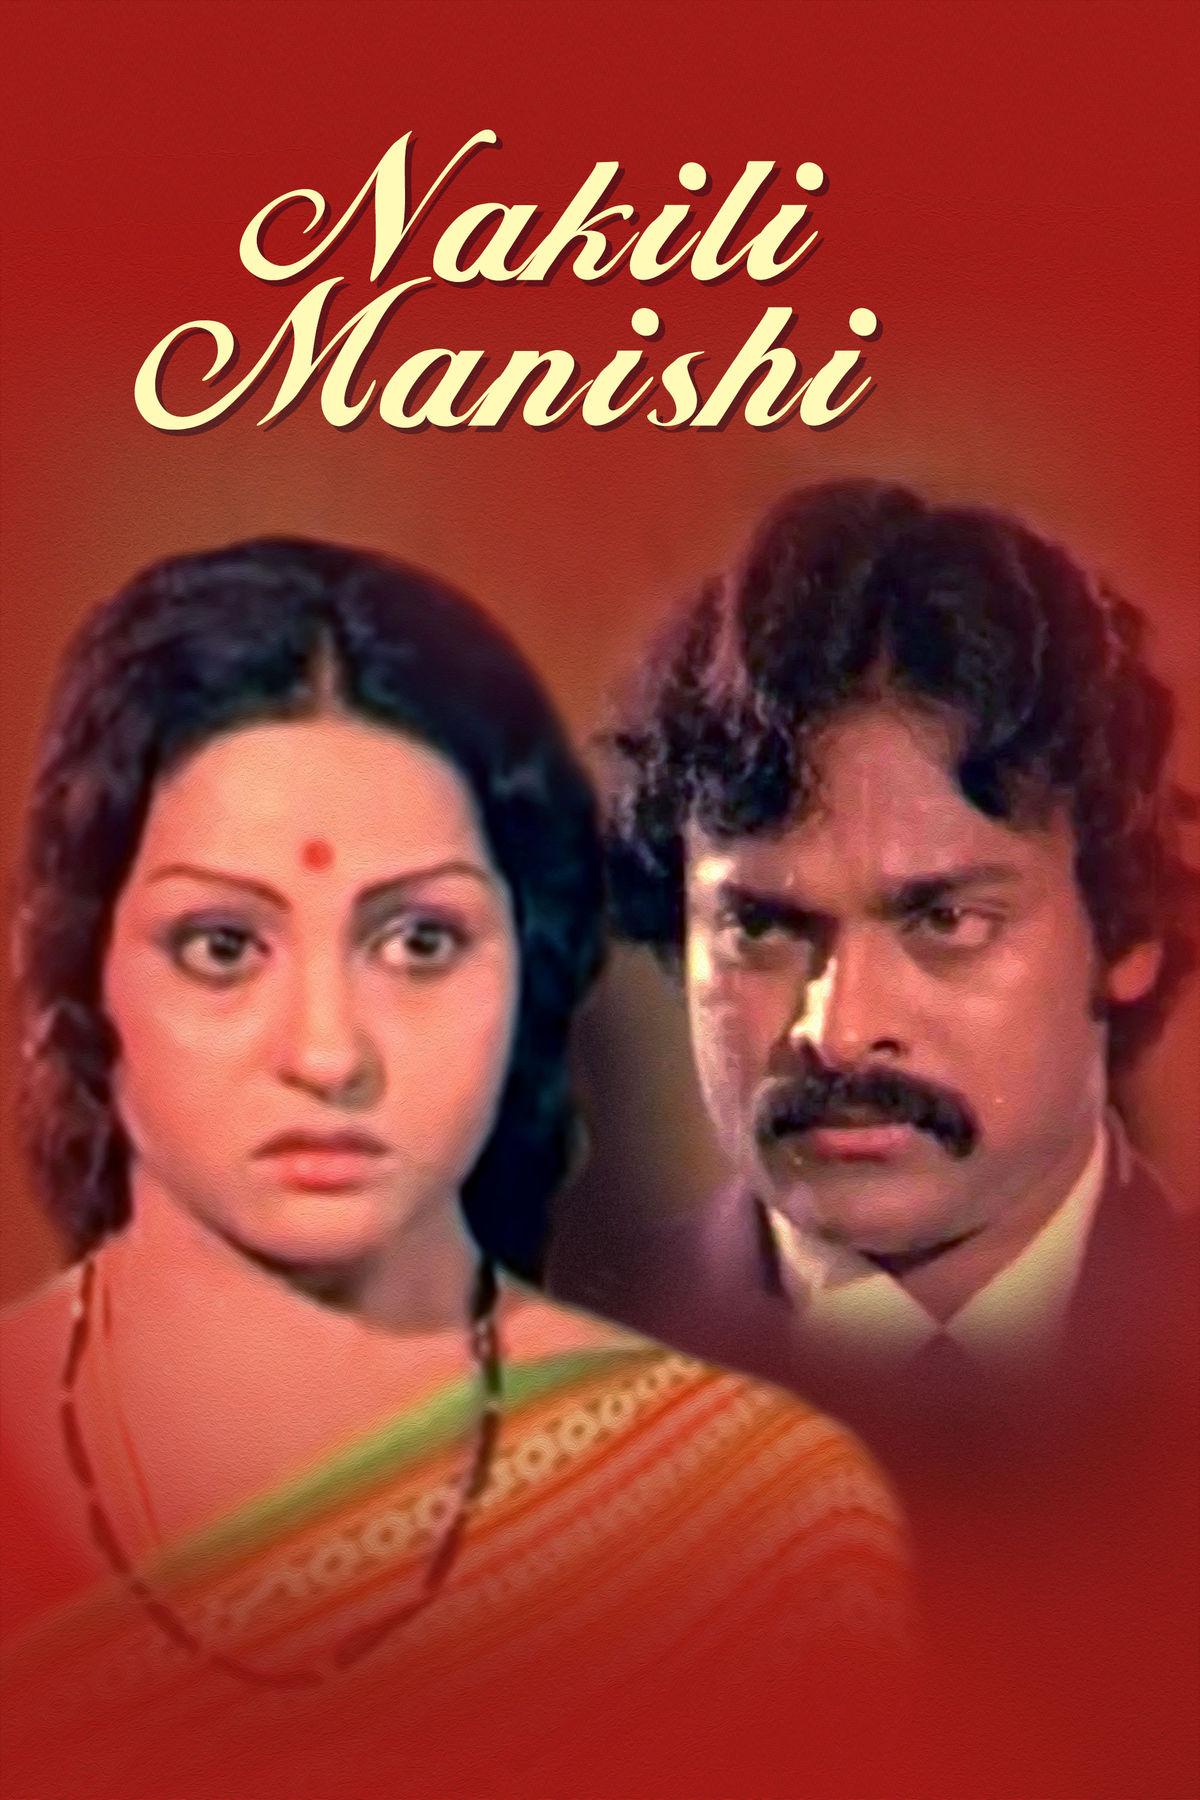 Suneeta Best Movies, TV Shows and Web Series List